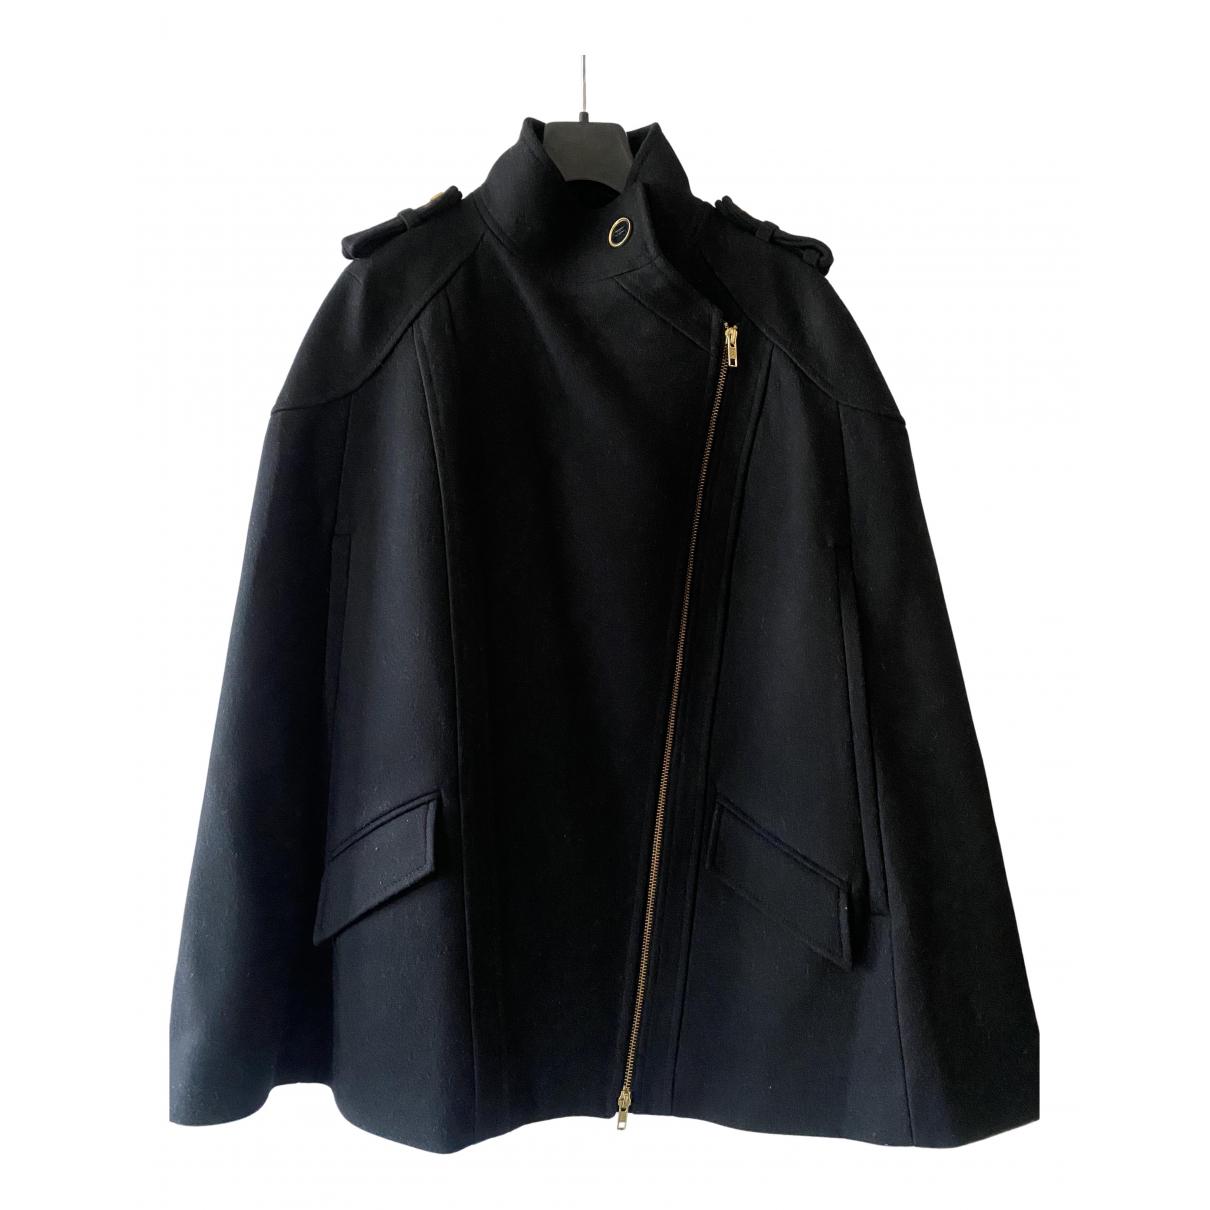 Reiss N Black Wool coat for Women 8 UK